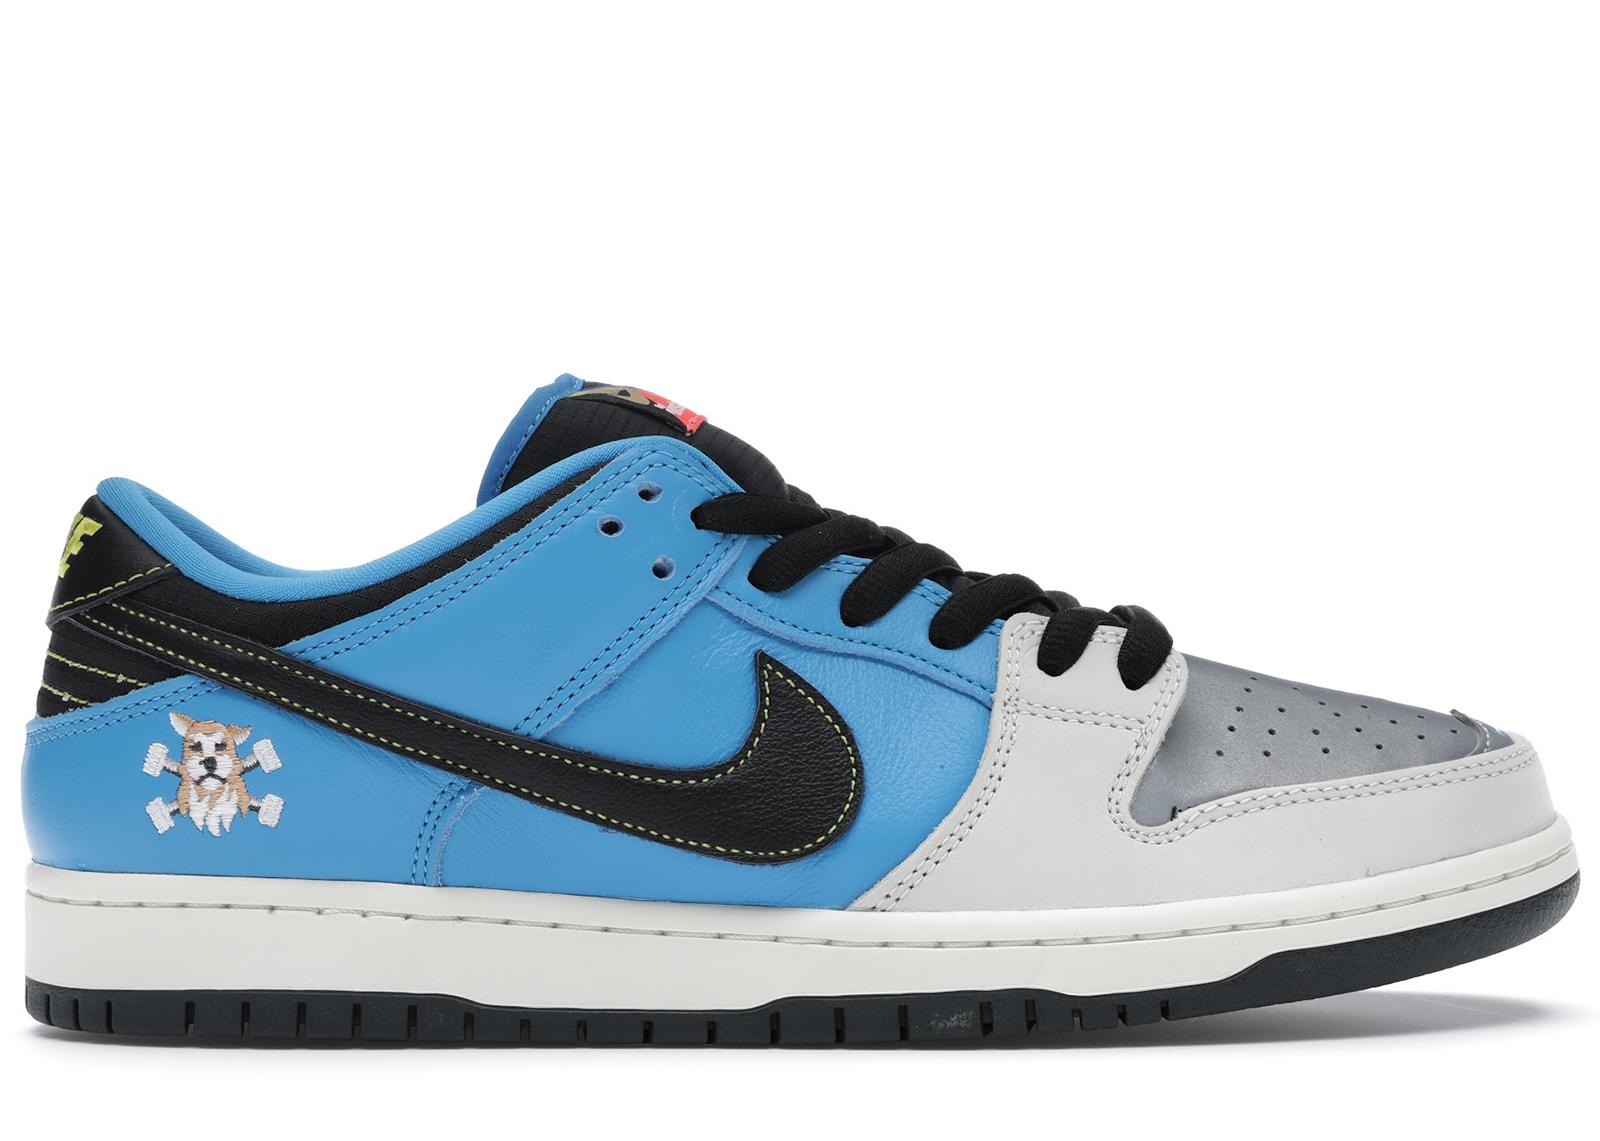 Buy Nike SB SB Dunk Low Shoes